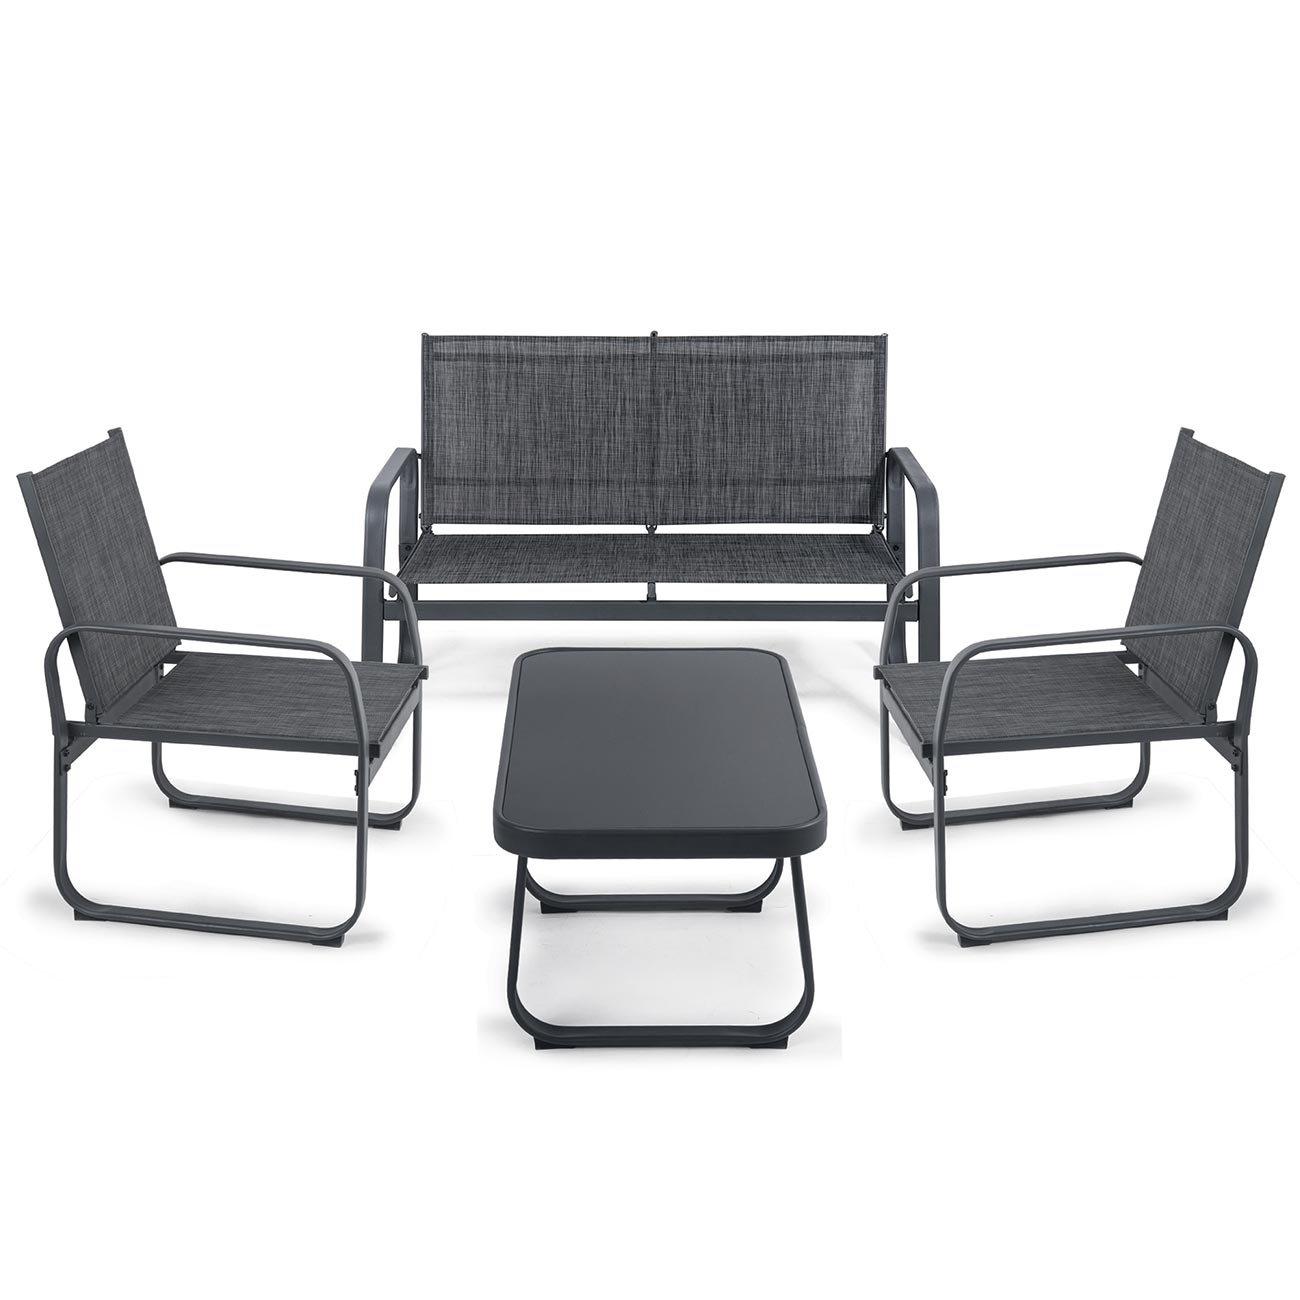 Gartenset Sitzgruppe Gartenmöbel Loungeset Sitzgarnitur ...